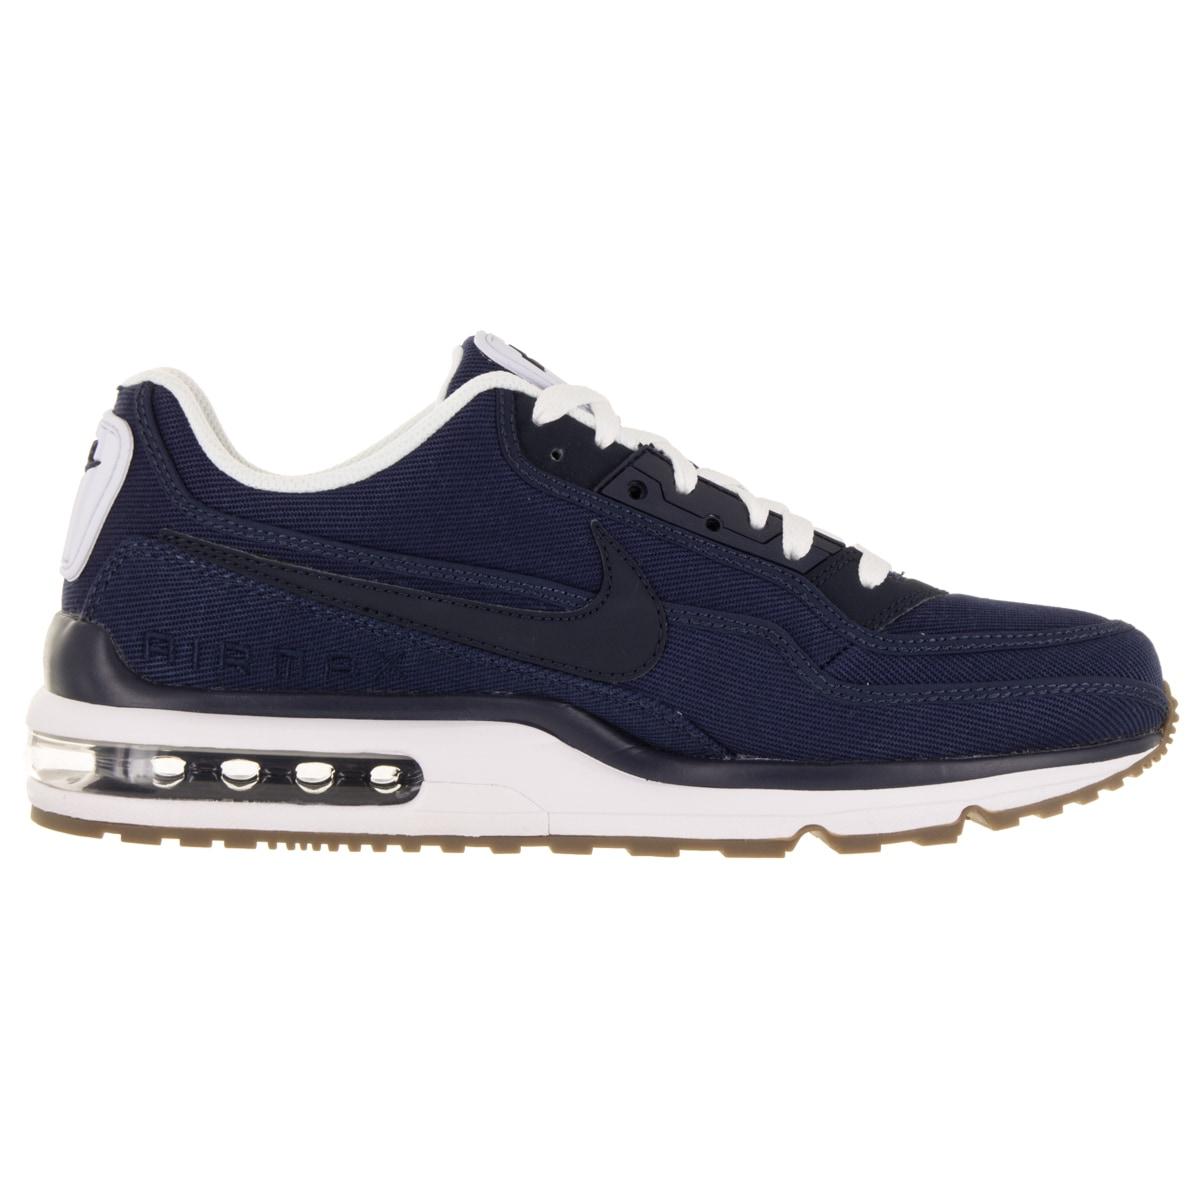 ef1e36c519 Shop Nike Men's Air Max Ltd 3 Txt Mid Navy/Obsidian/White/Gm Dark Brw Running  Shoe - Free Shipping Today - Overstock - 12120035